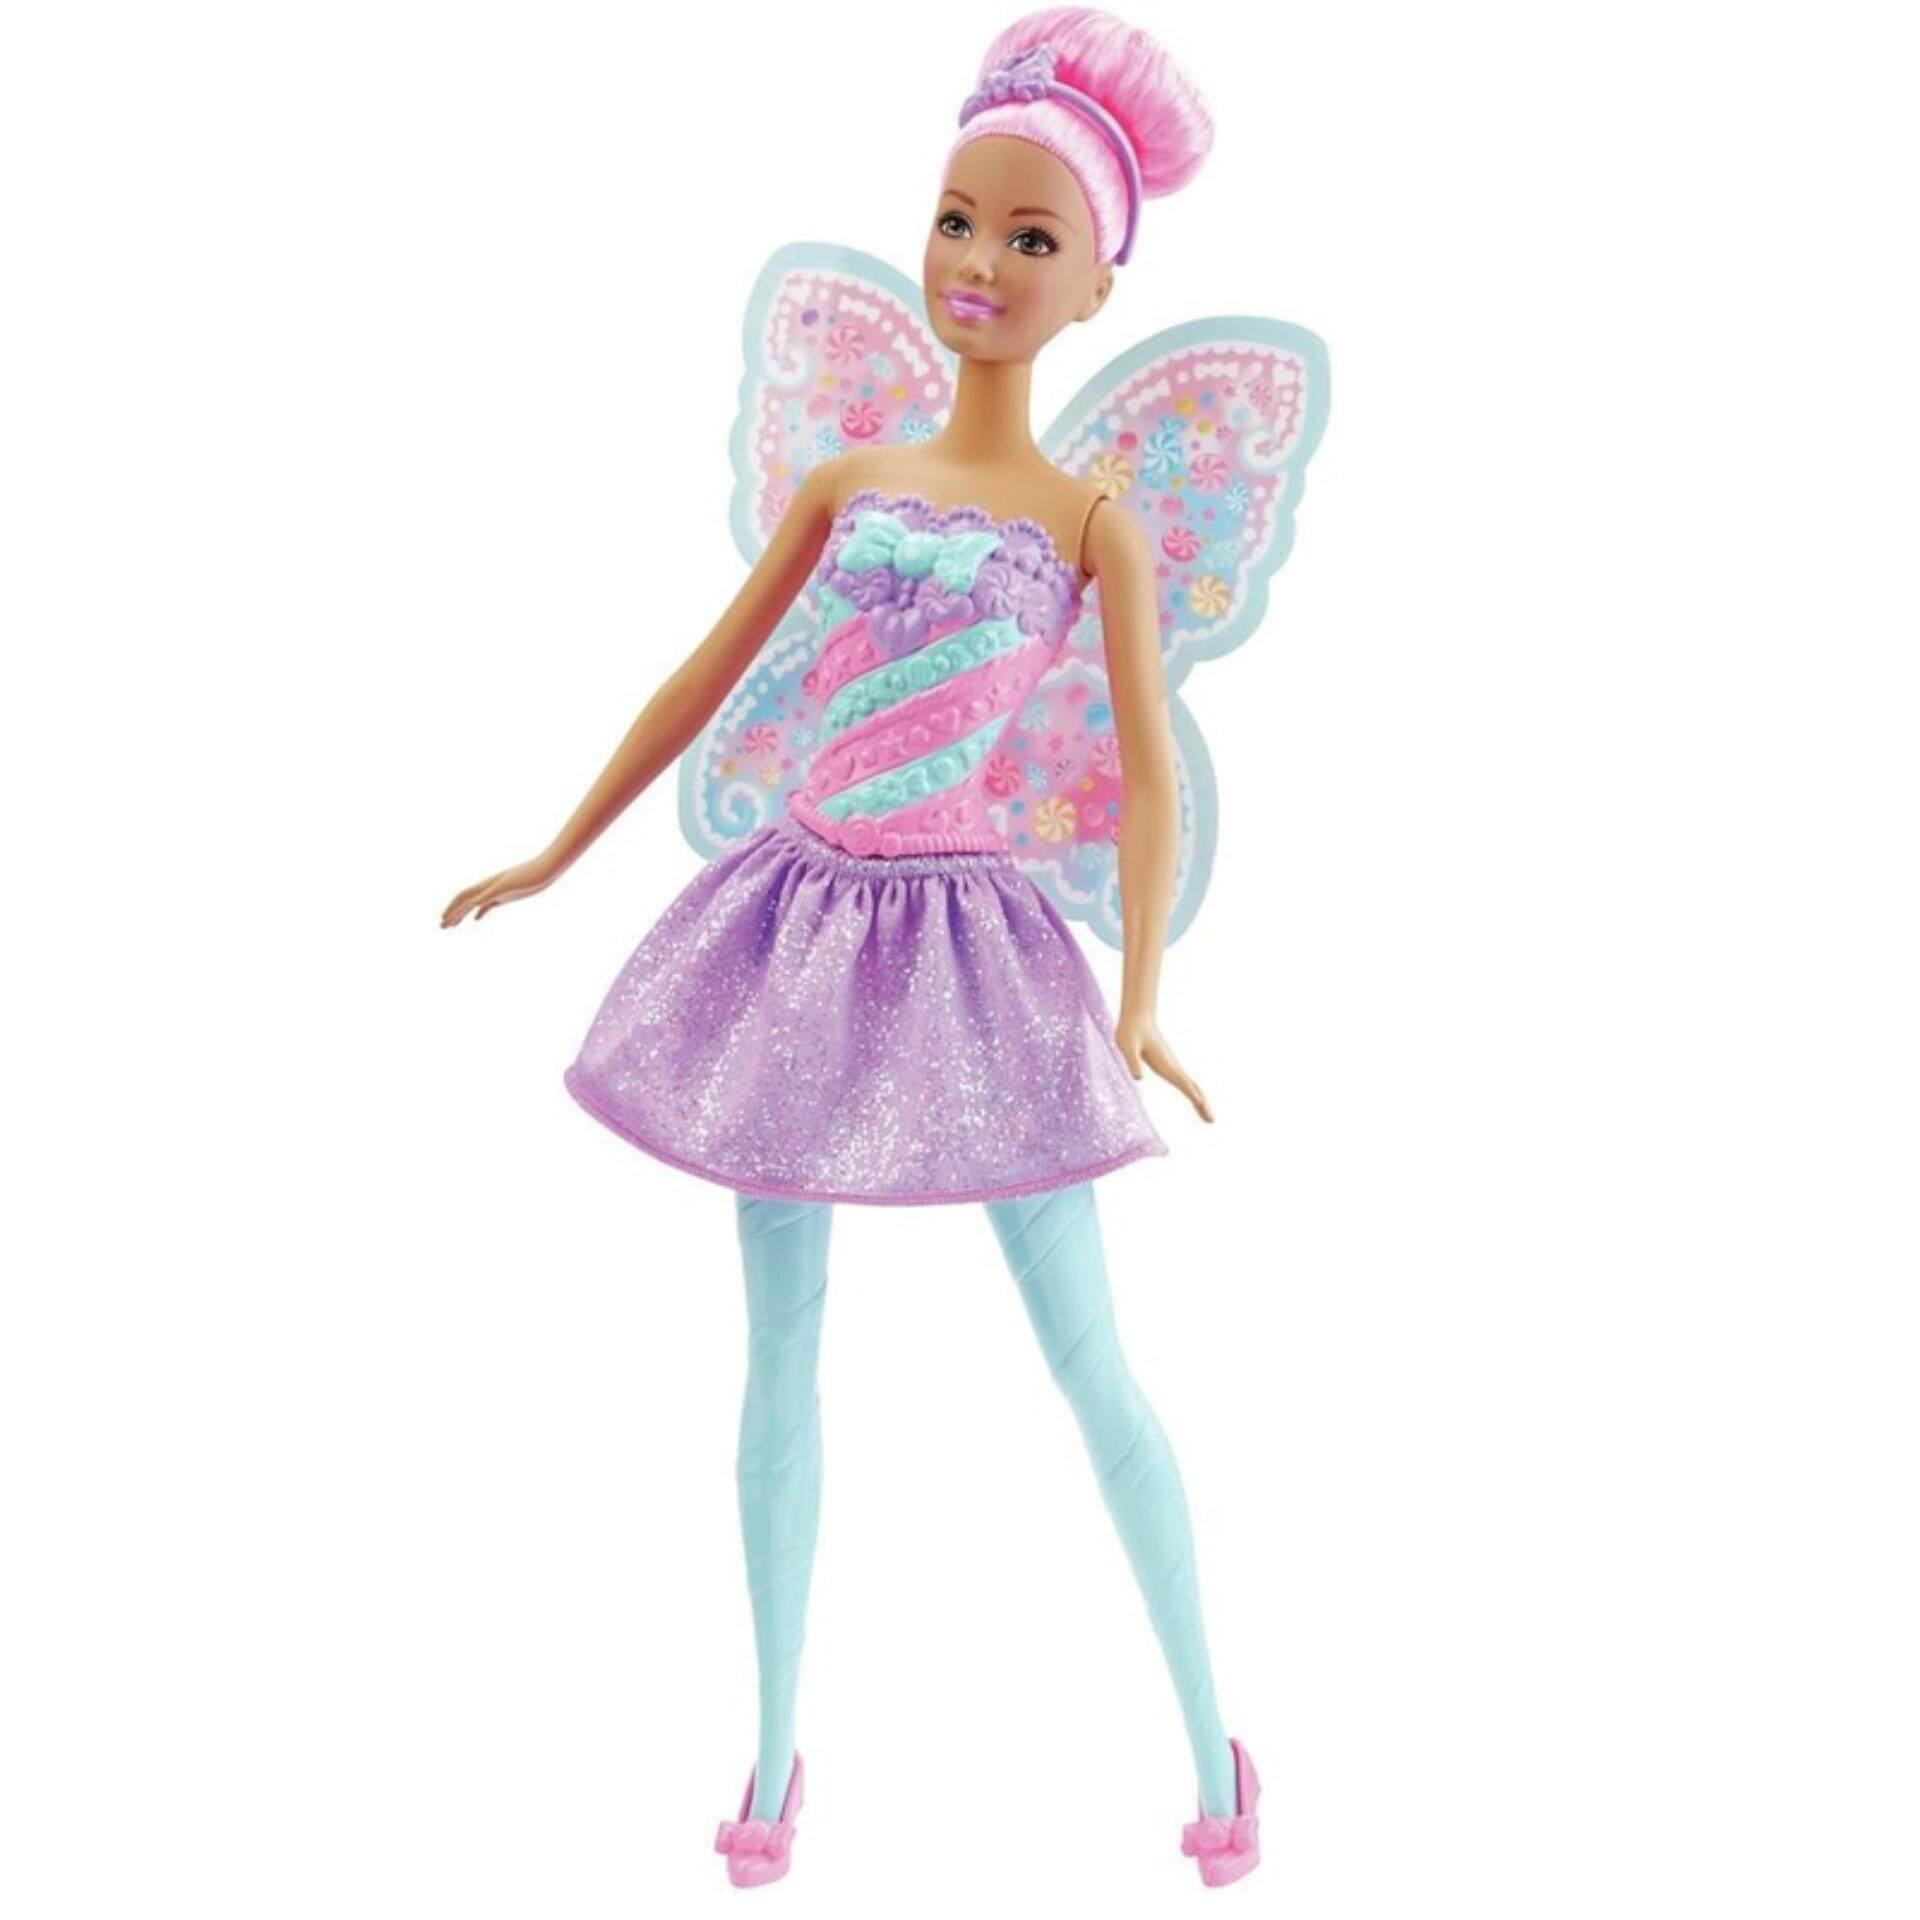 Barbie ตุ๊กตา บาร์บี้ Candy Kingdom Fairy Doll By Barbie Official.